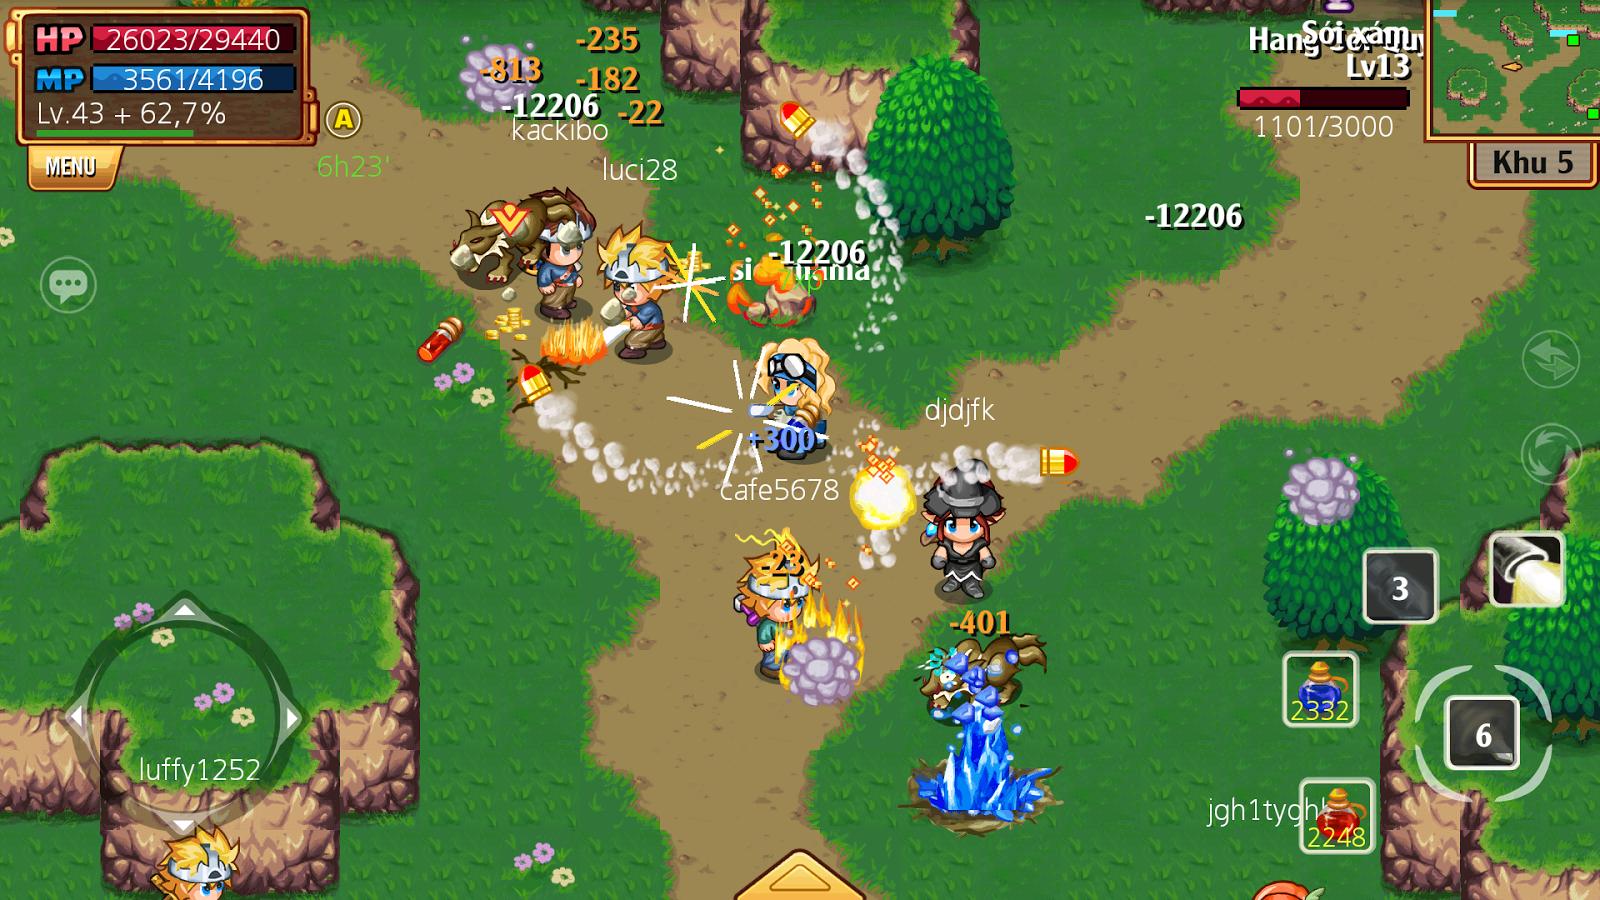 Screenshots of Ksatria Online for iPhone